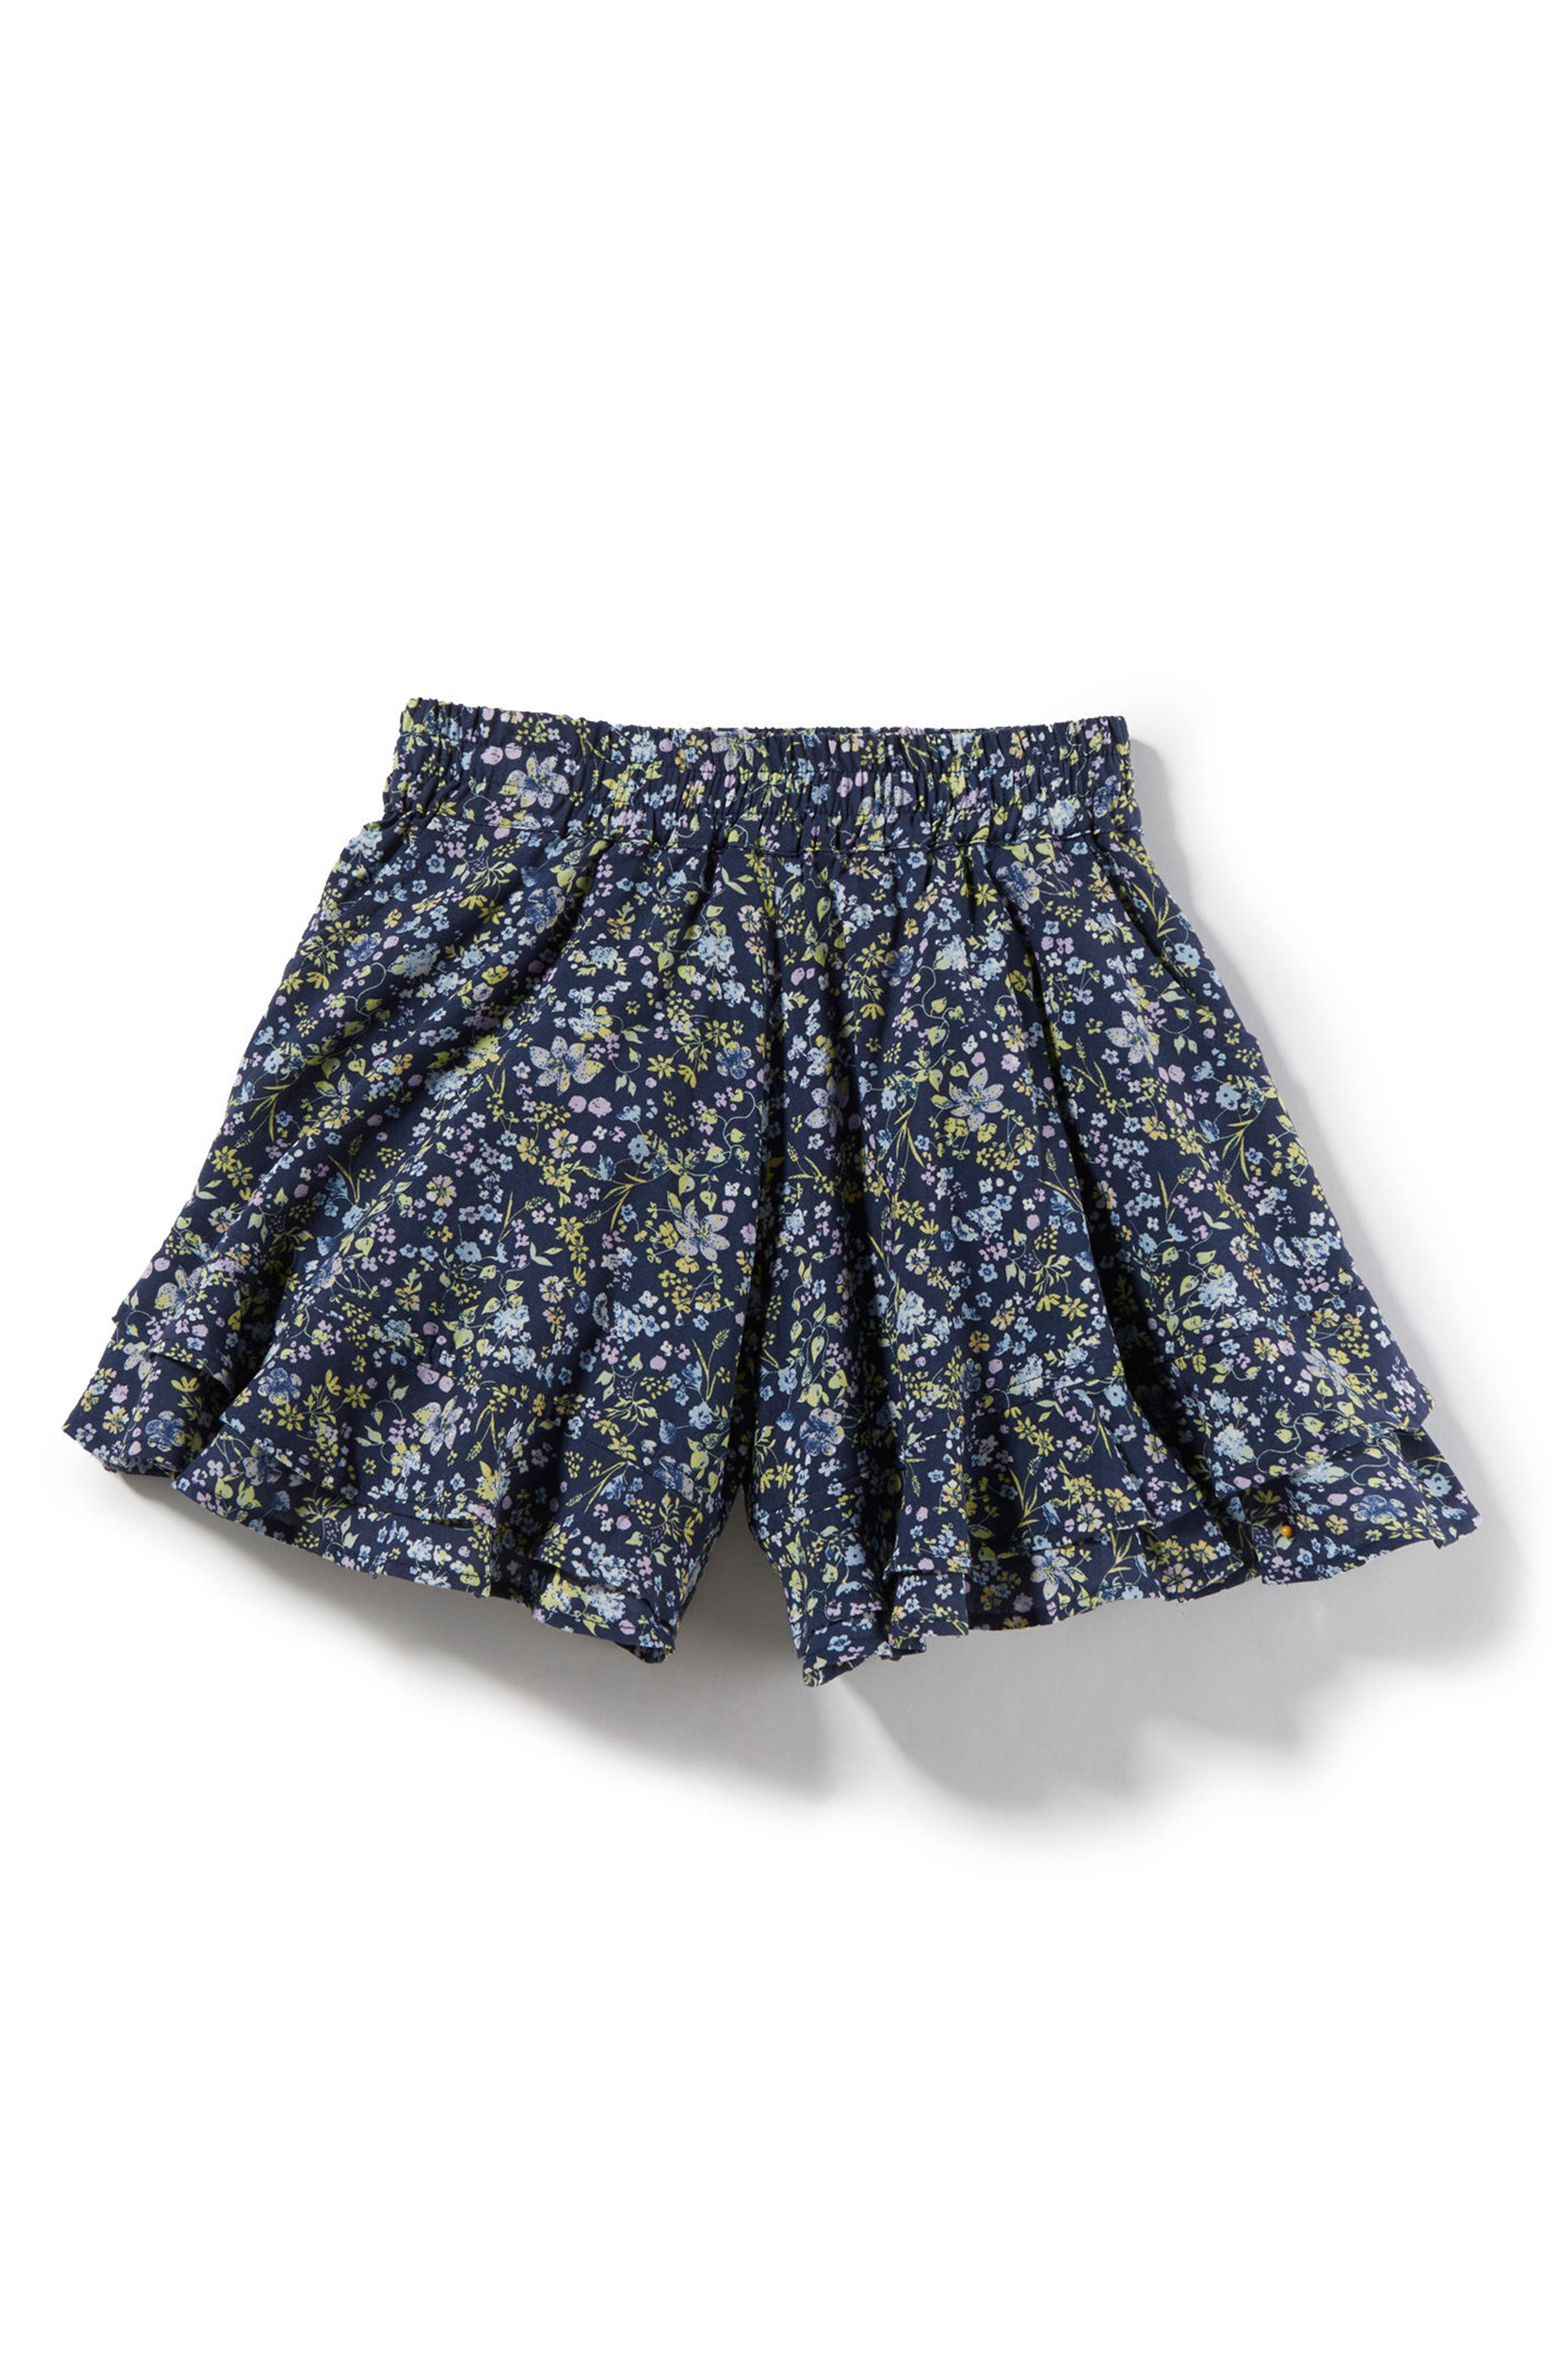 Paige Ruffle Shorts,                             Main thumbnail 1, color,                             Blue